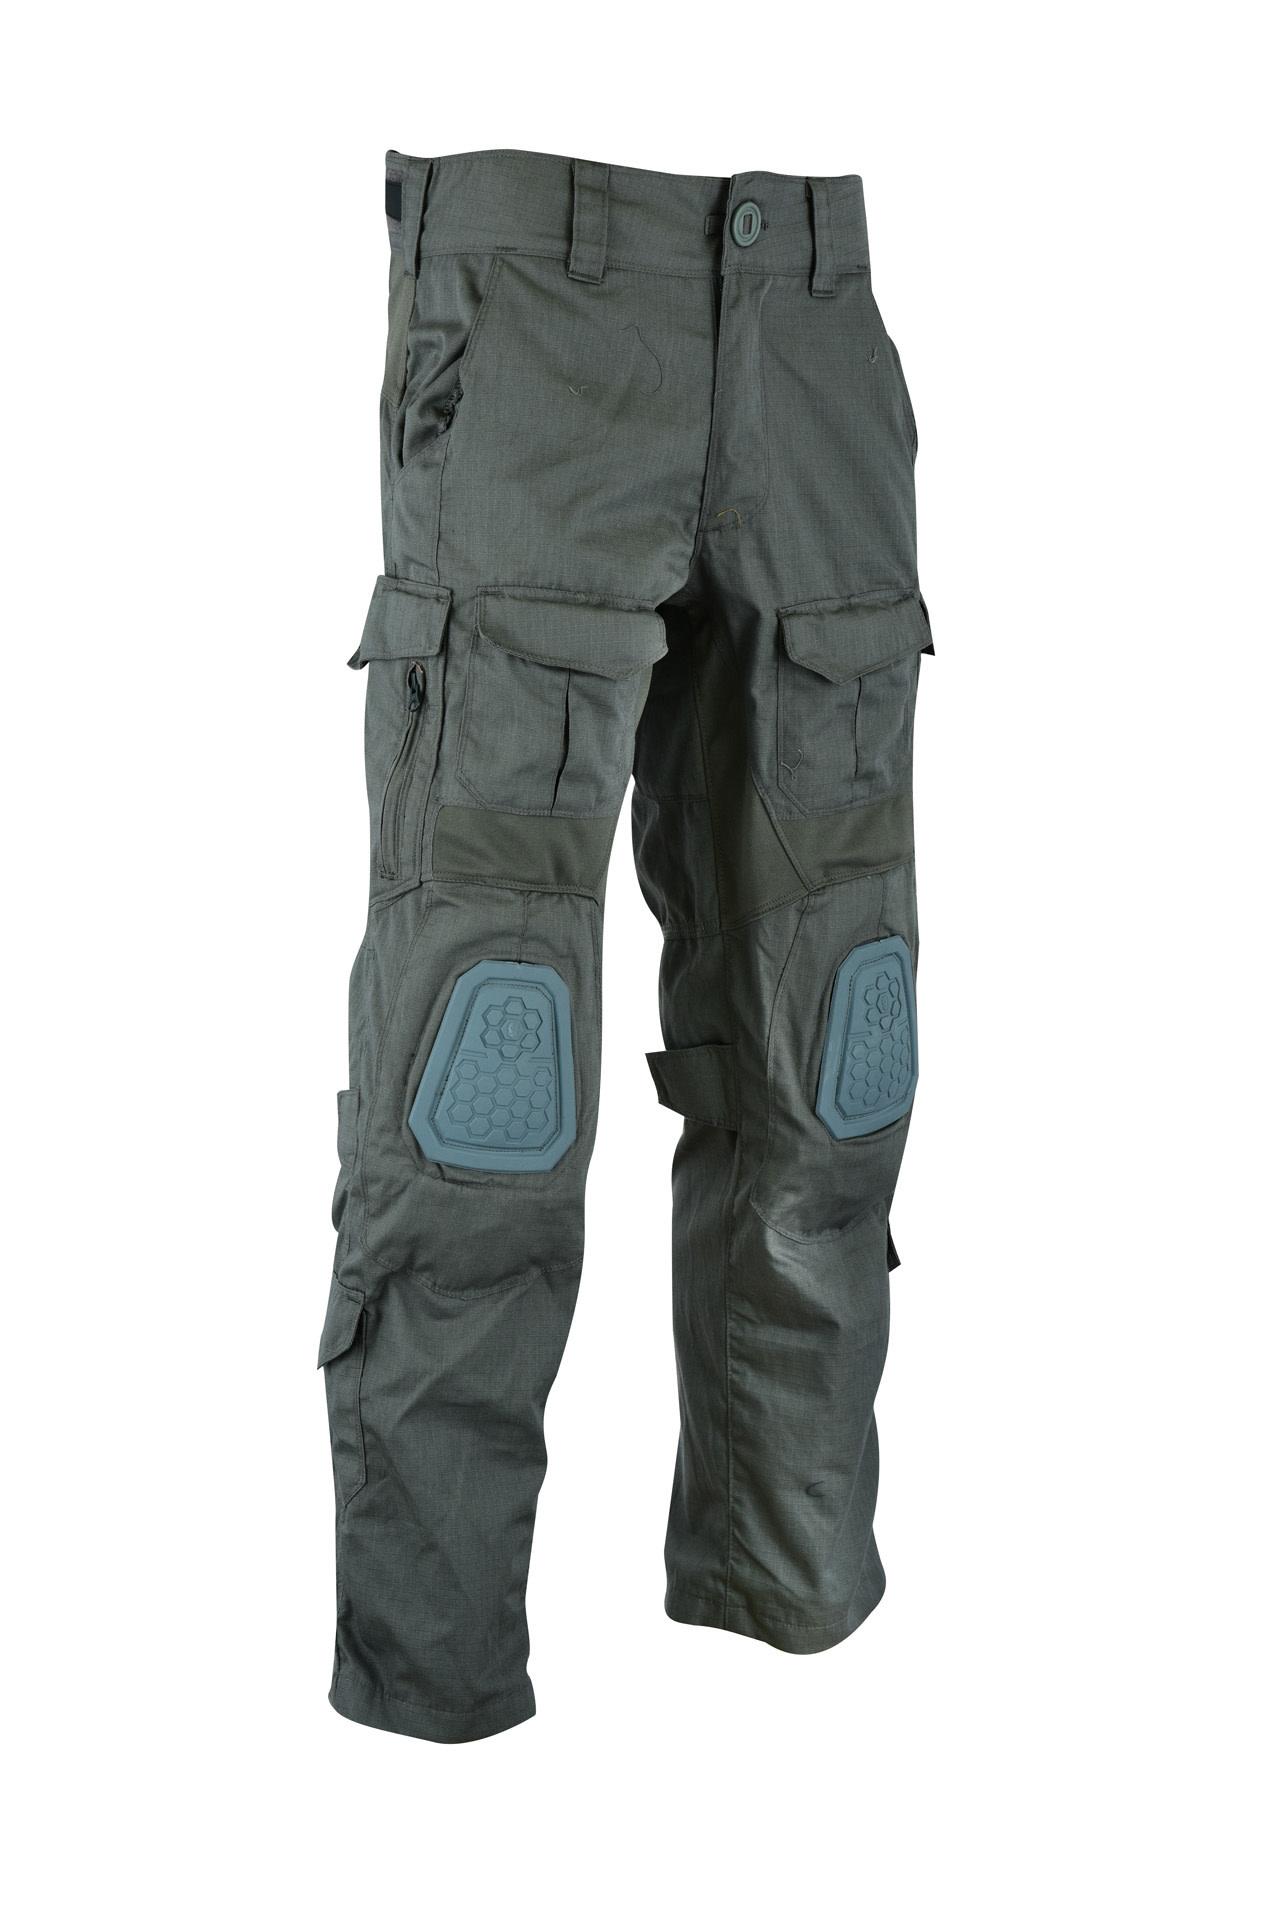 Shadow Strategic Shadow Elite PATHFINDER PANTS Grey SHE-3494